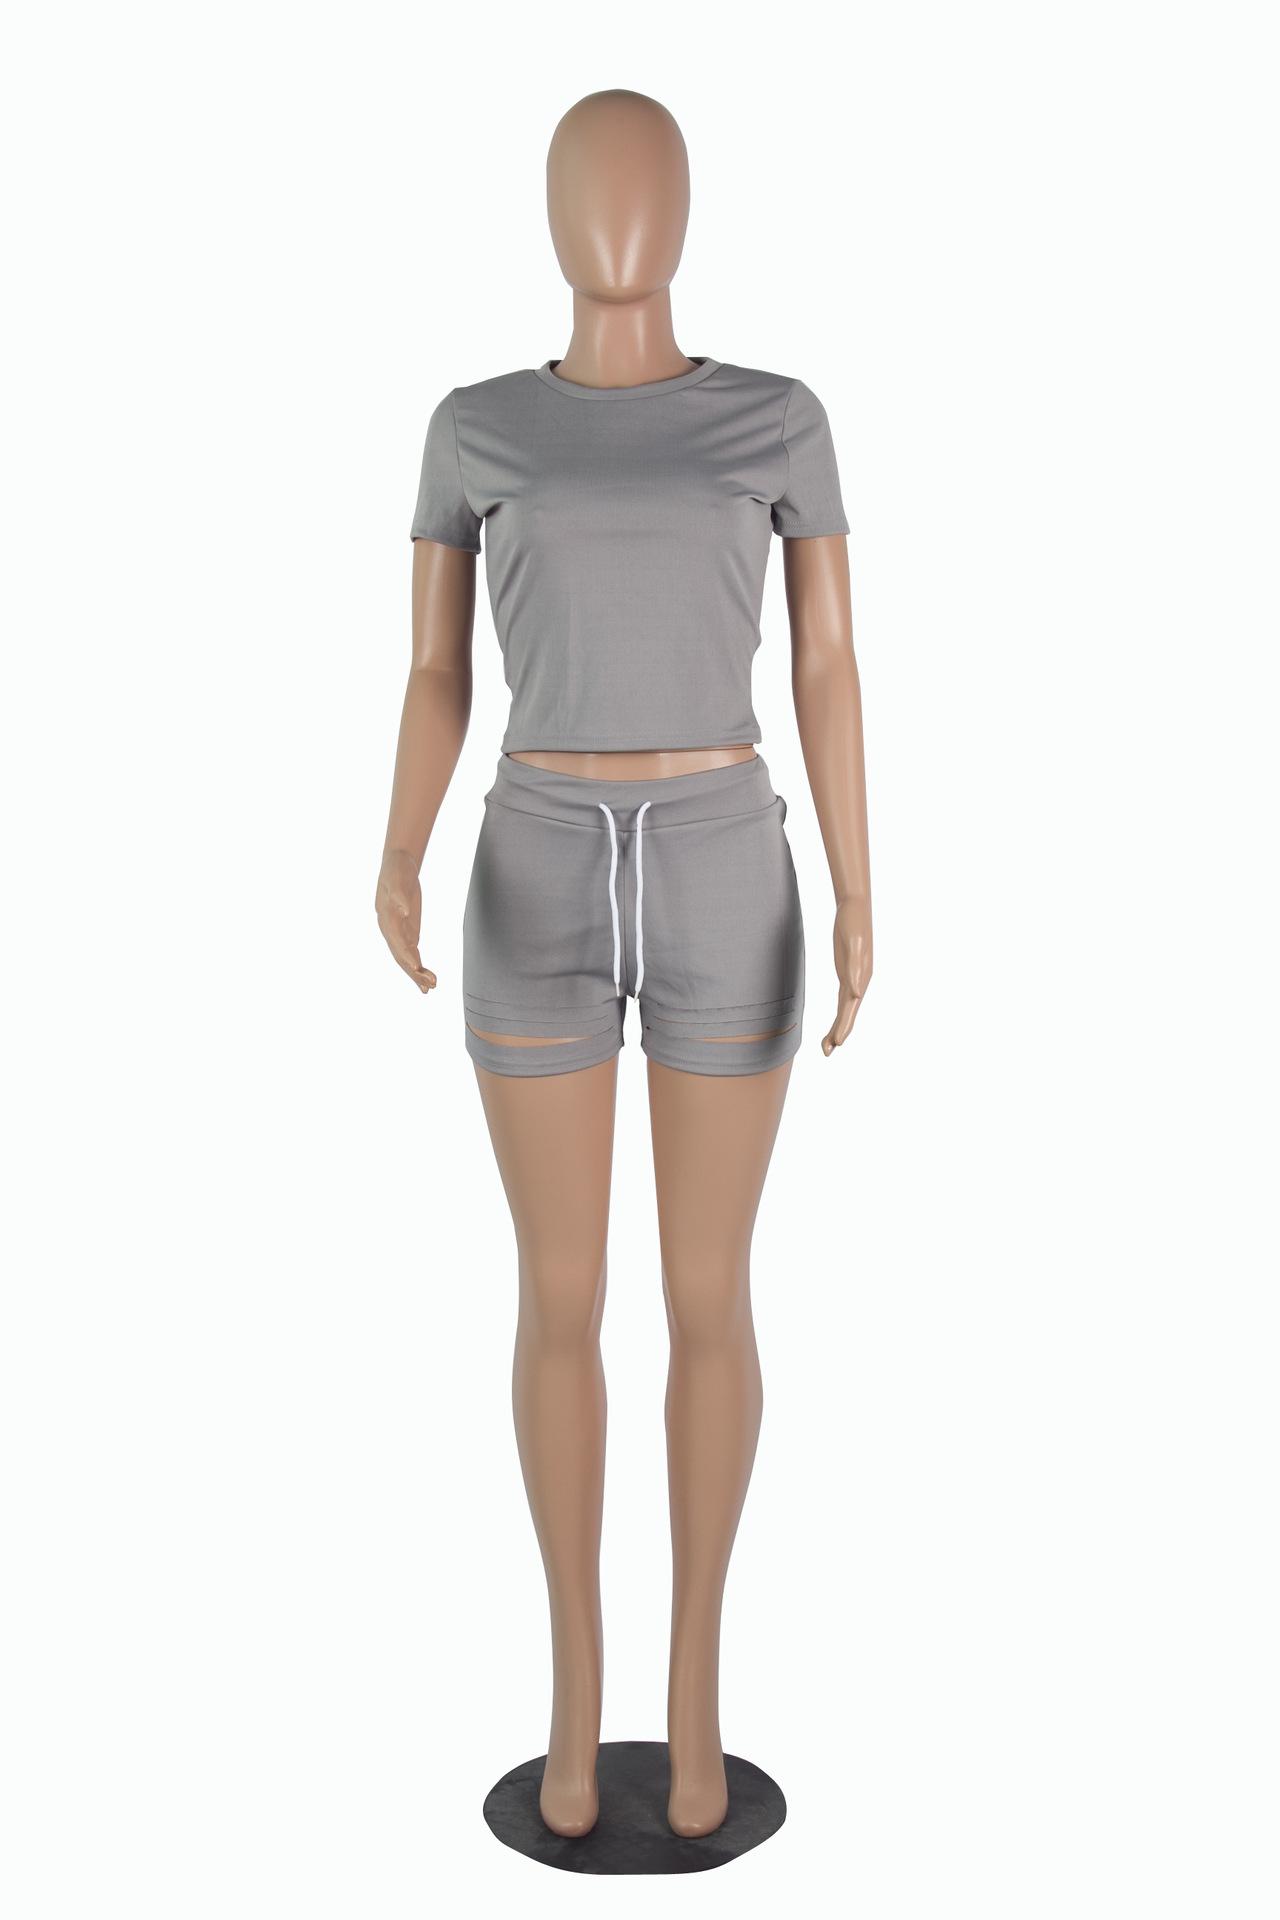 FM-CY9027 summer new plain t-shirts pink sets womens biker short sets